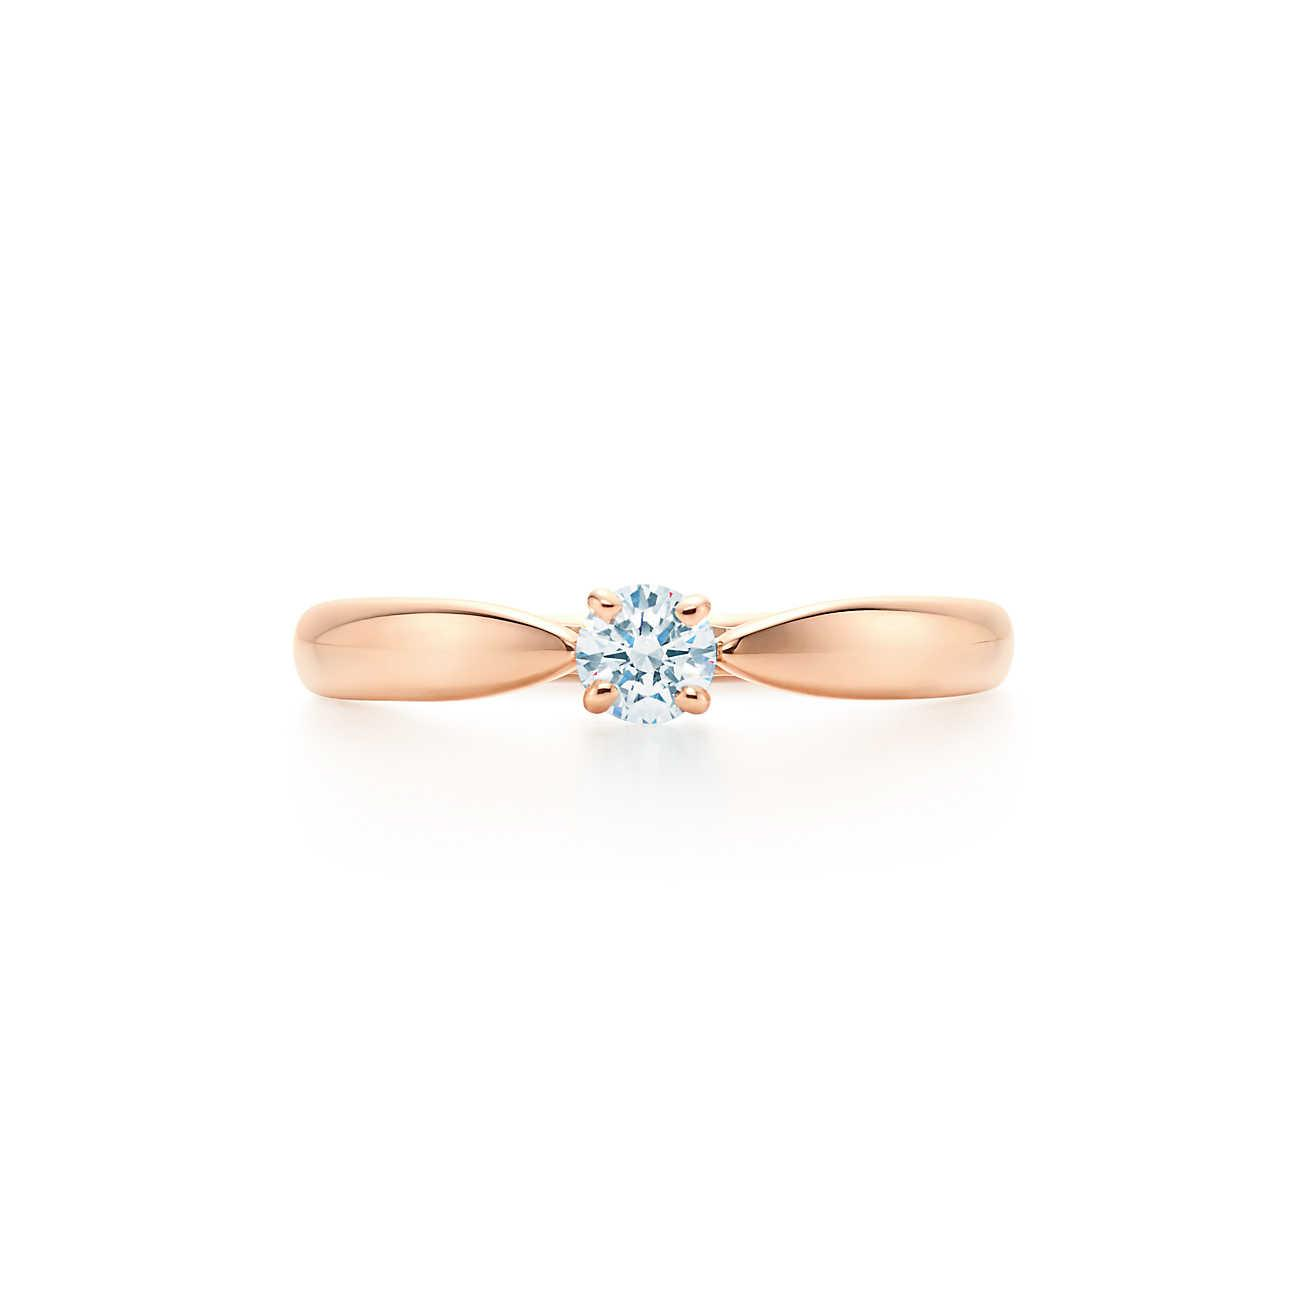 Tiffany Harmony ring in 18k rose gold - Size 10 1/2 Tiffany & Co. iRhi3